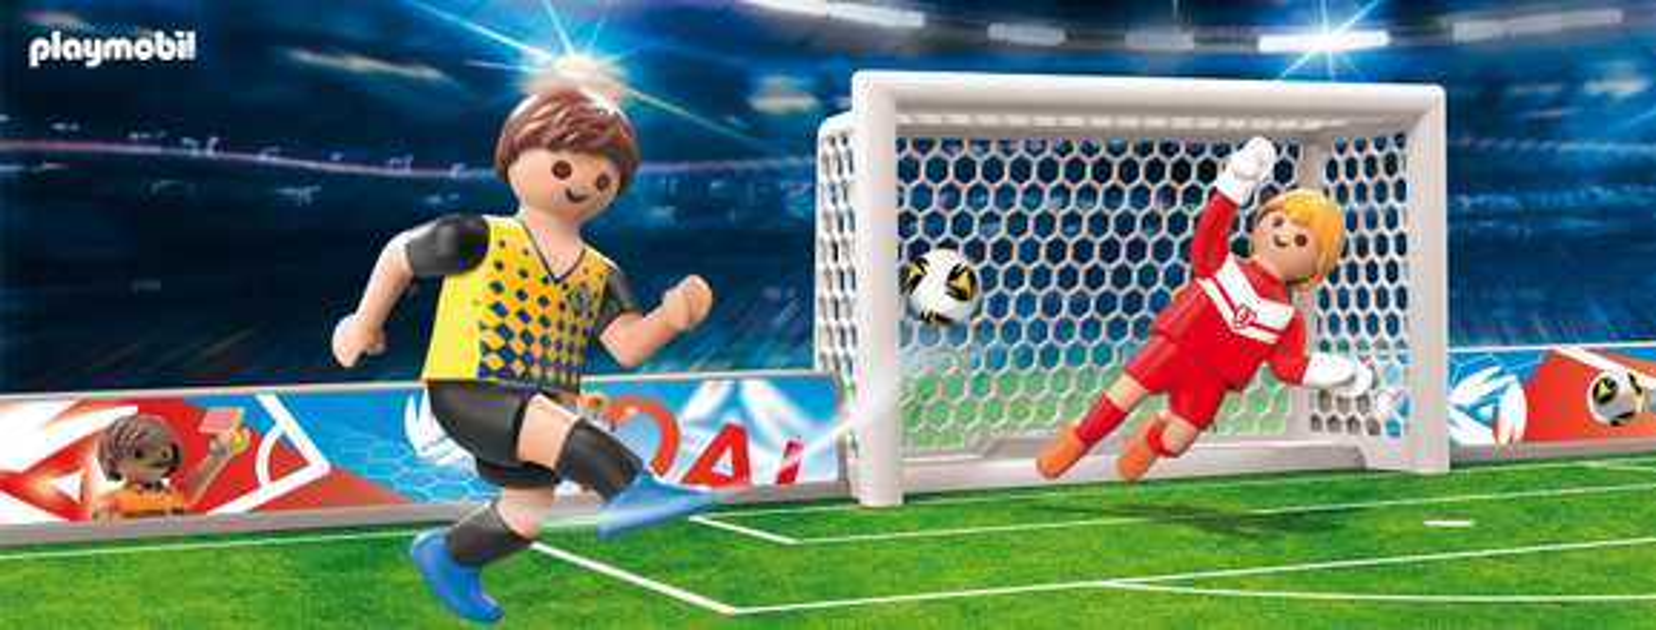 Playmobil – château, football, pirates ou ferme en promotion – Dealabs